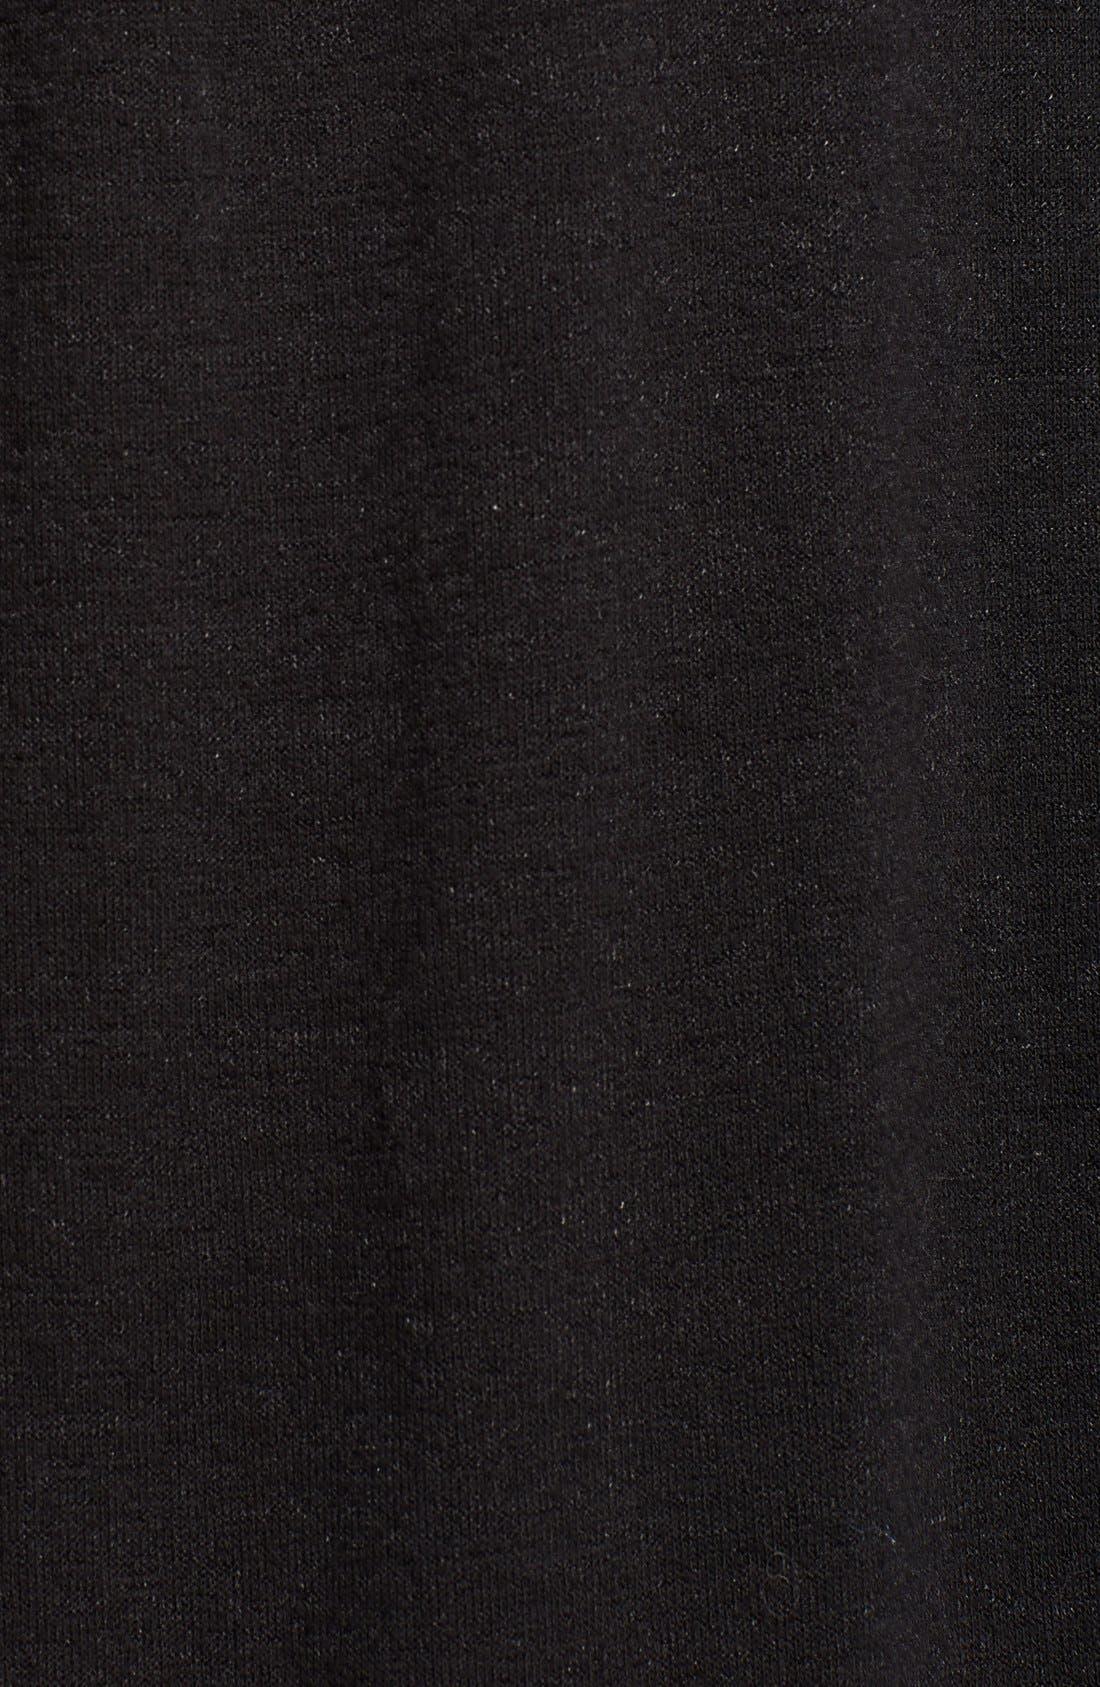 Alternate Image 3  - rag & bone/JEAN 'Giada' Long Sleeve Tee